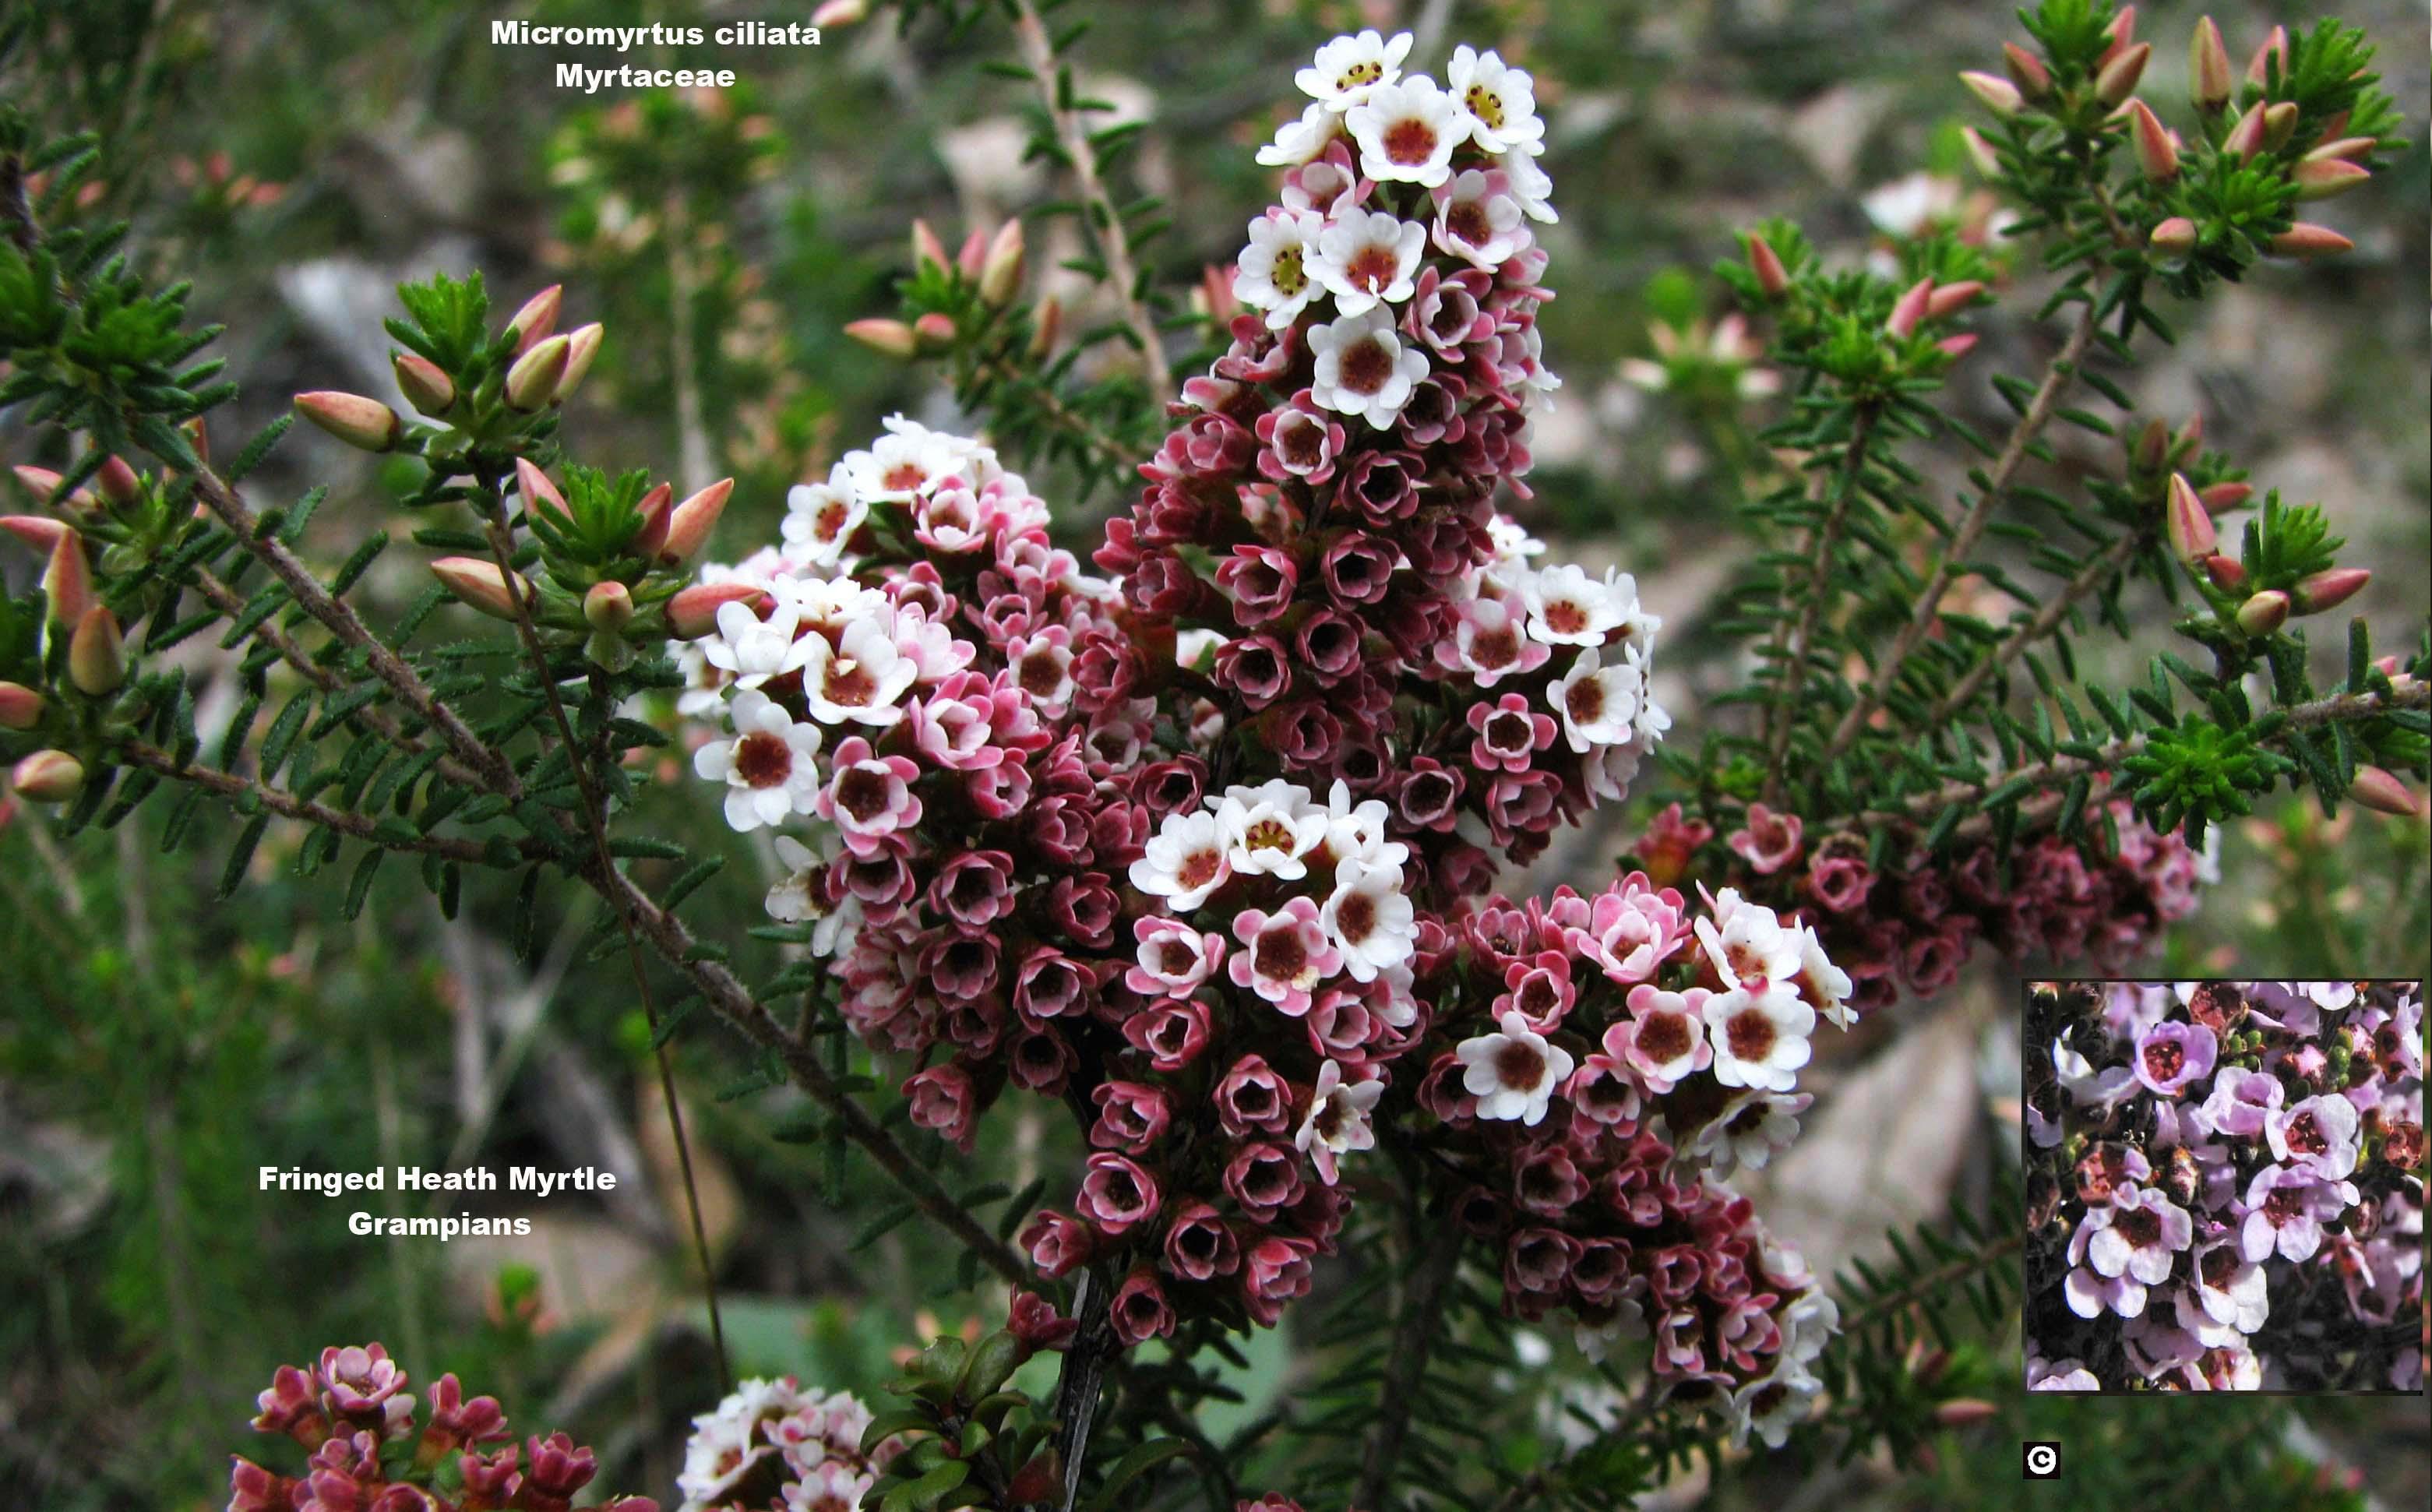 Micromyrtus ciliata flora ALA source